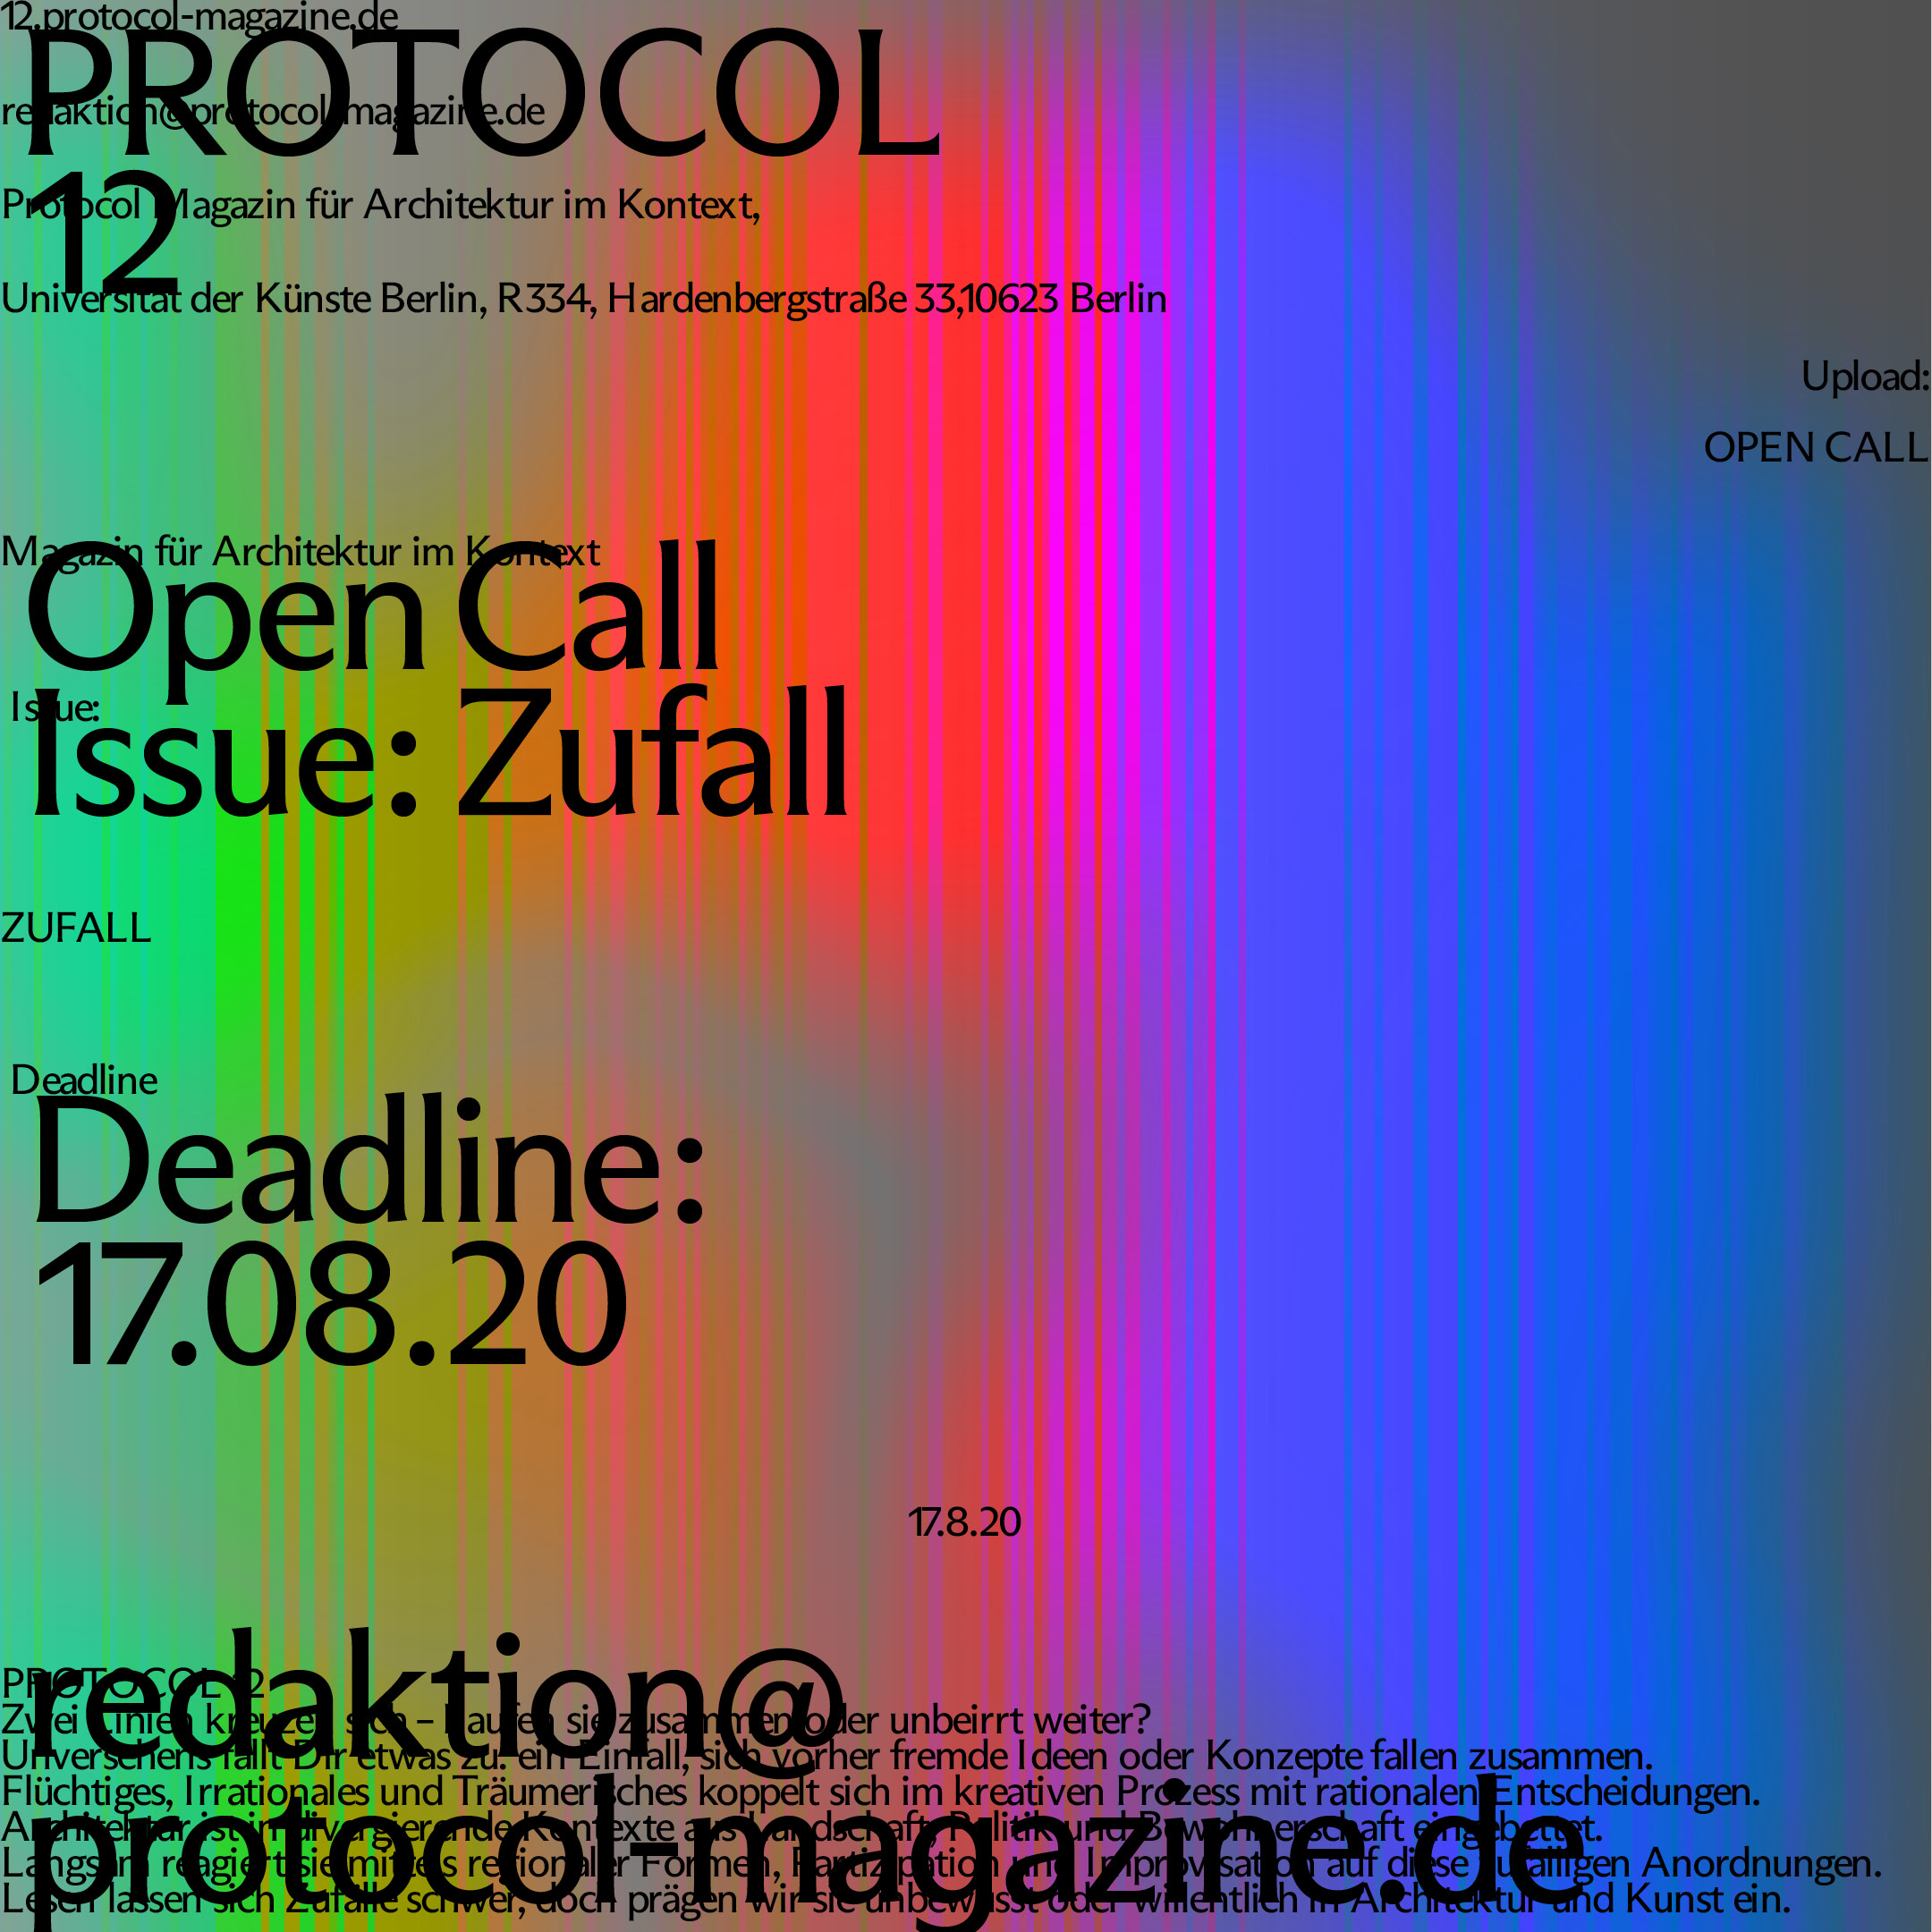 p12_Instagram-Redaktion_Protocol-Magazin_Magazin-fuer-Architektur-im-Kontext14